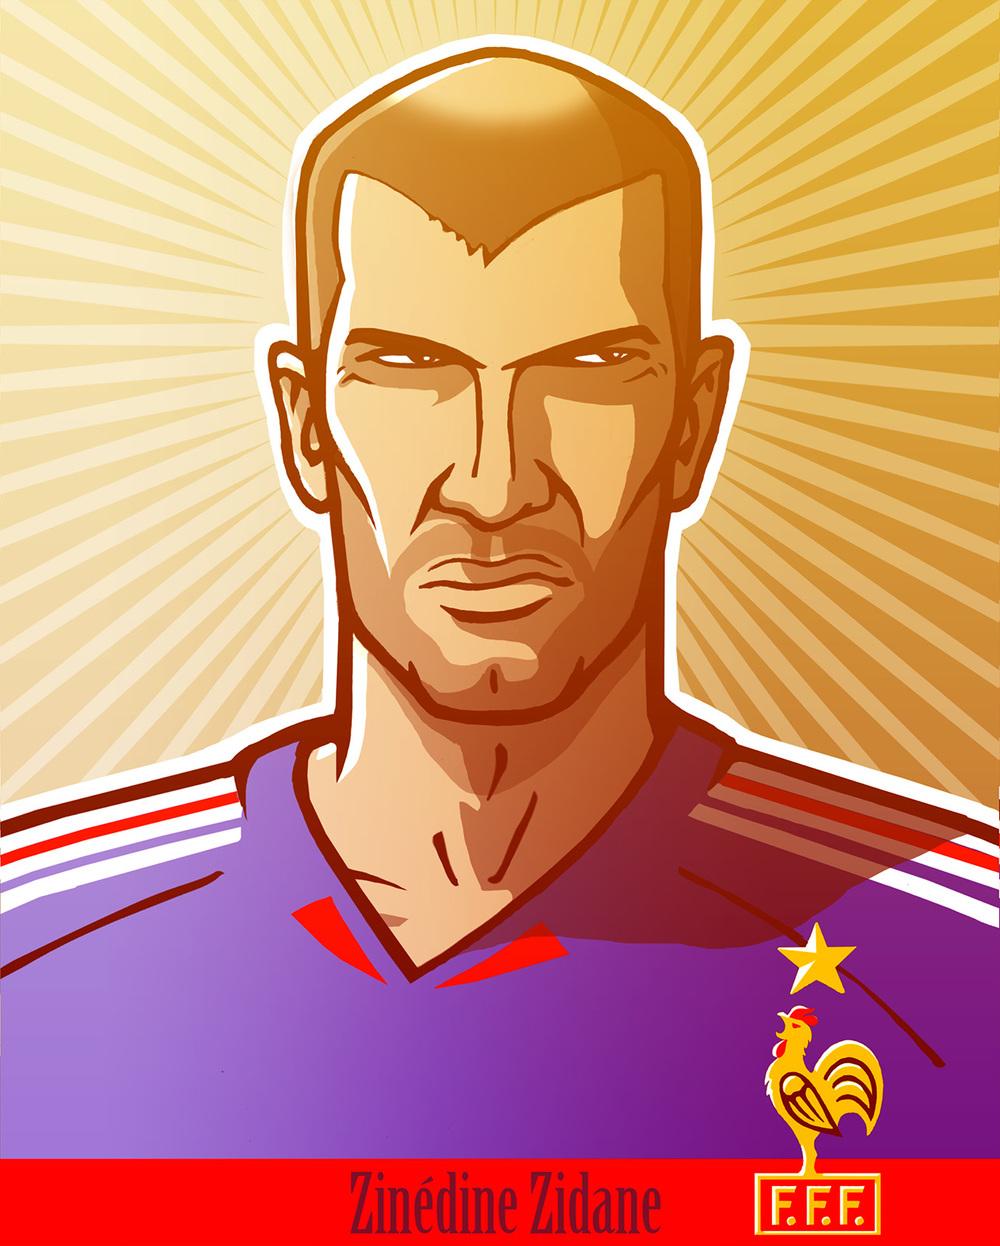 Zinedine_Zidane.jpg